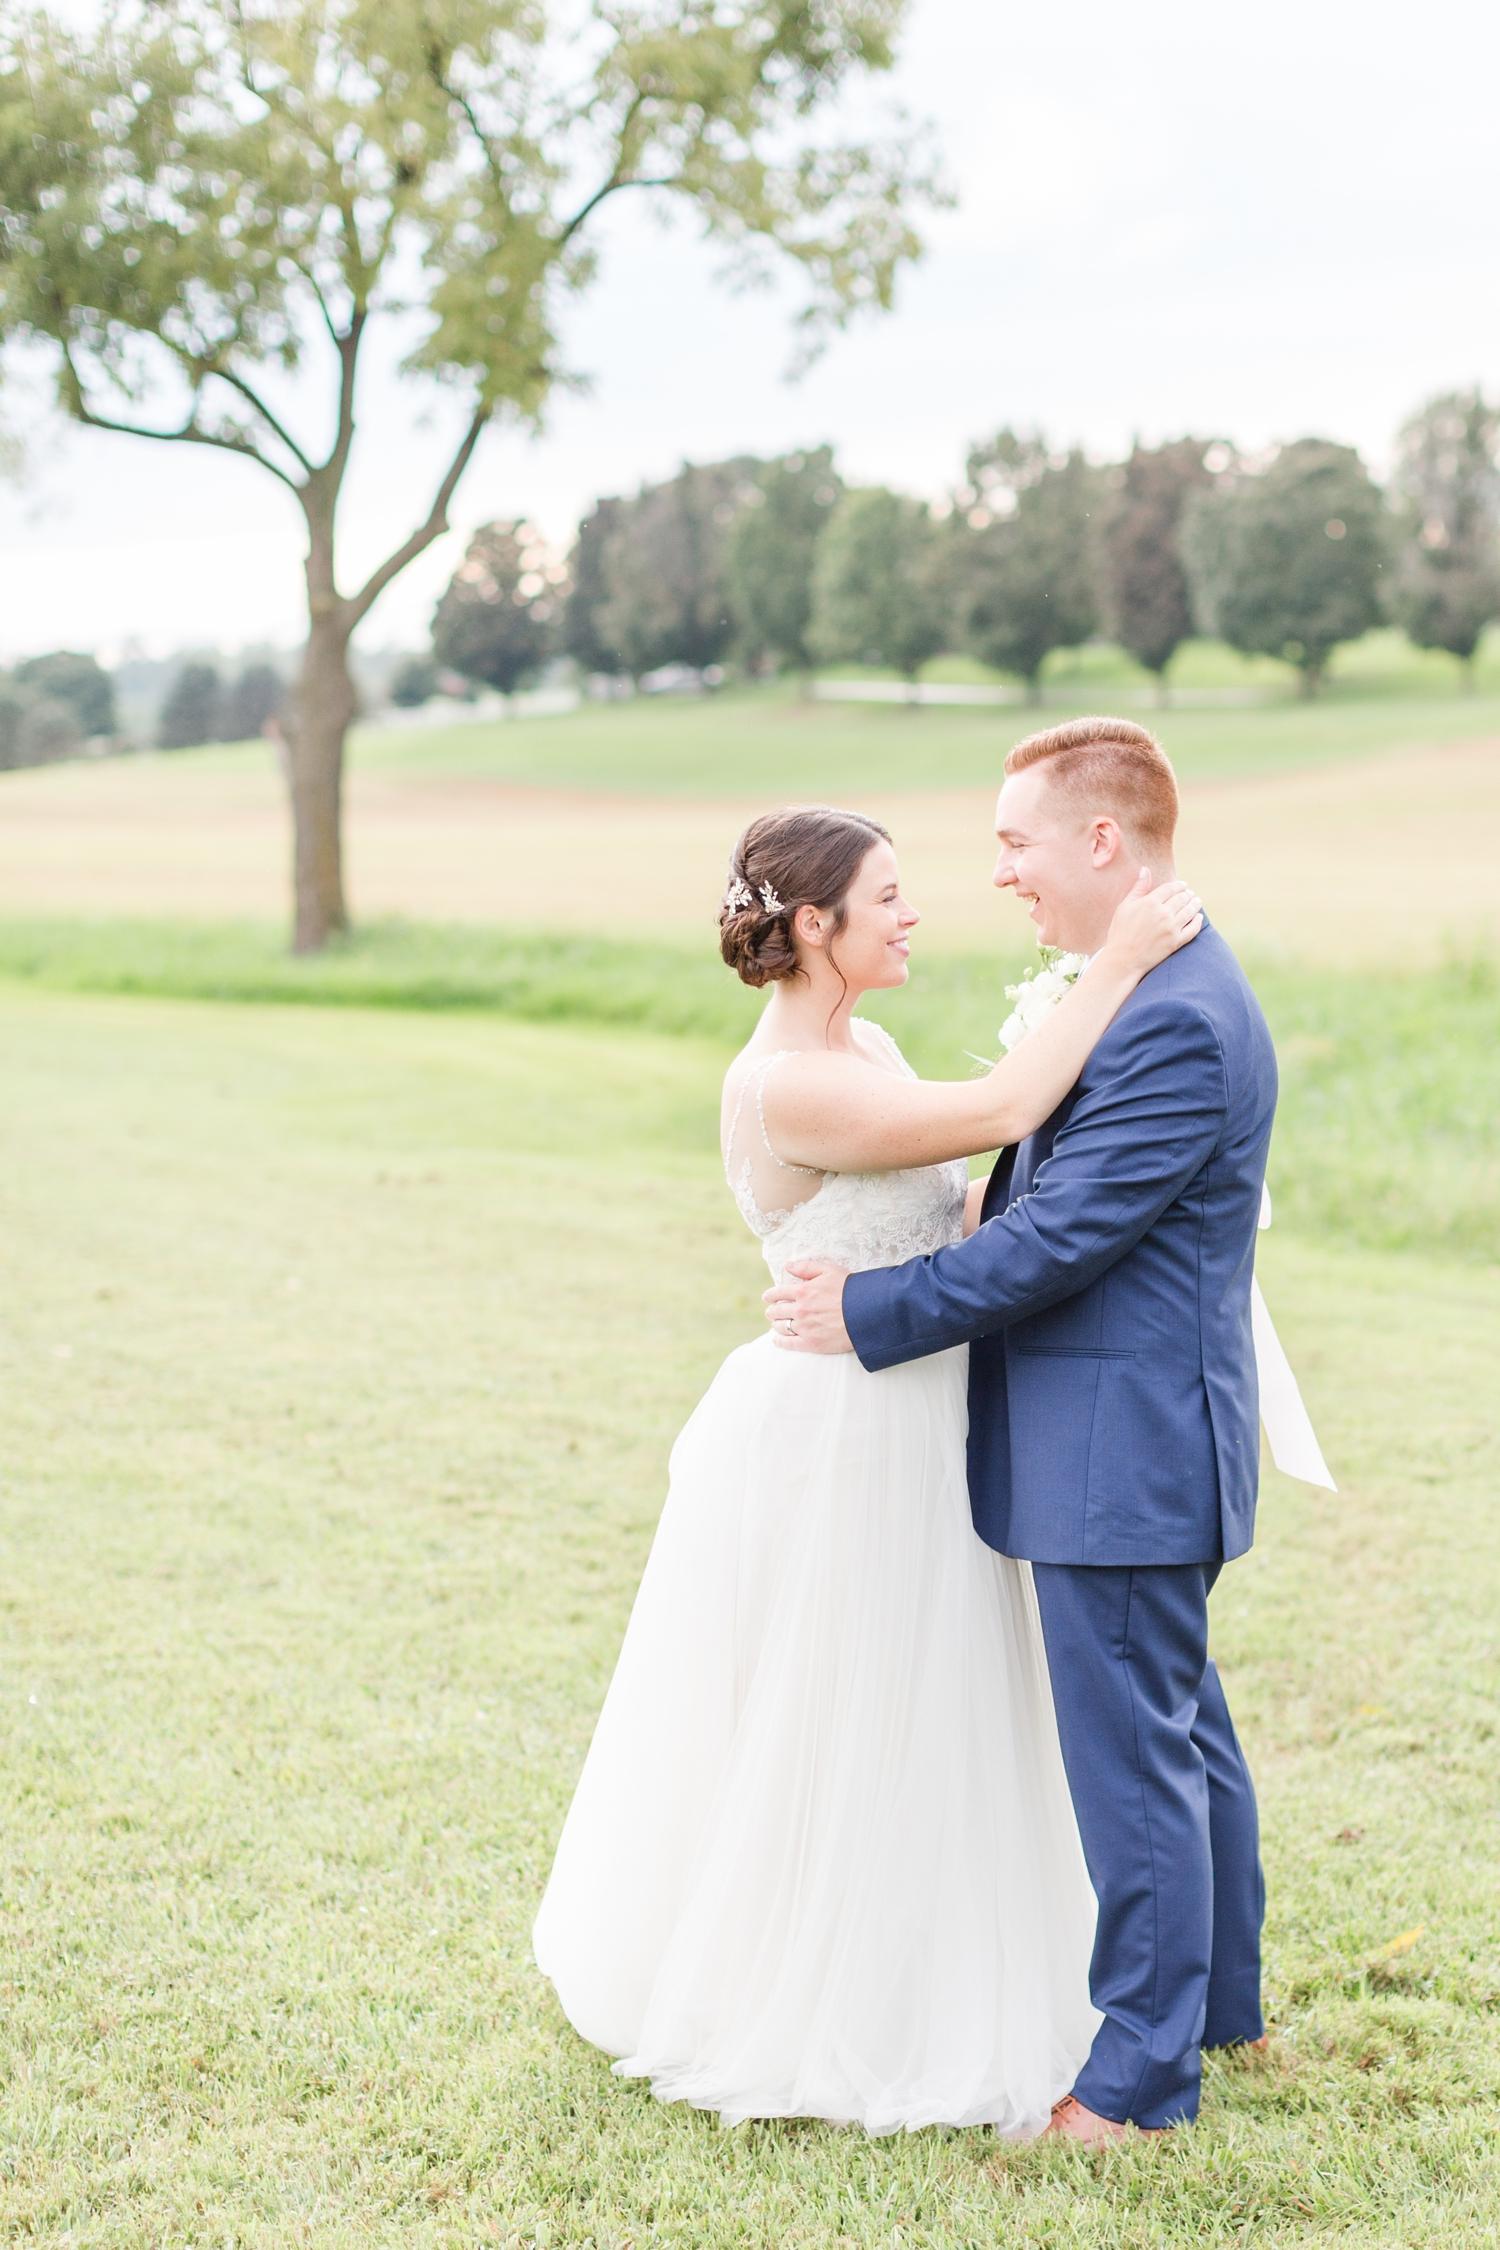 ADKINS WEDDING HIGHLIGHTS-226_The-Granary-wedding-Valley-Pike-Farm-Market-Virginia-wedding-photographer-anna-grace-photography-photo.jpg